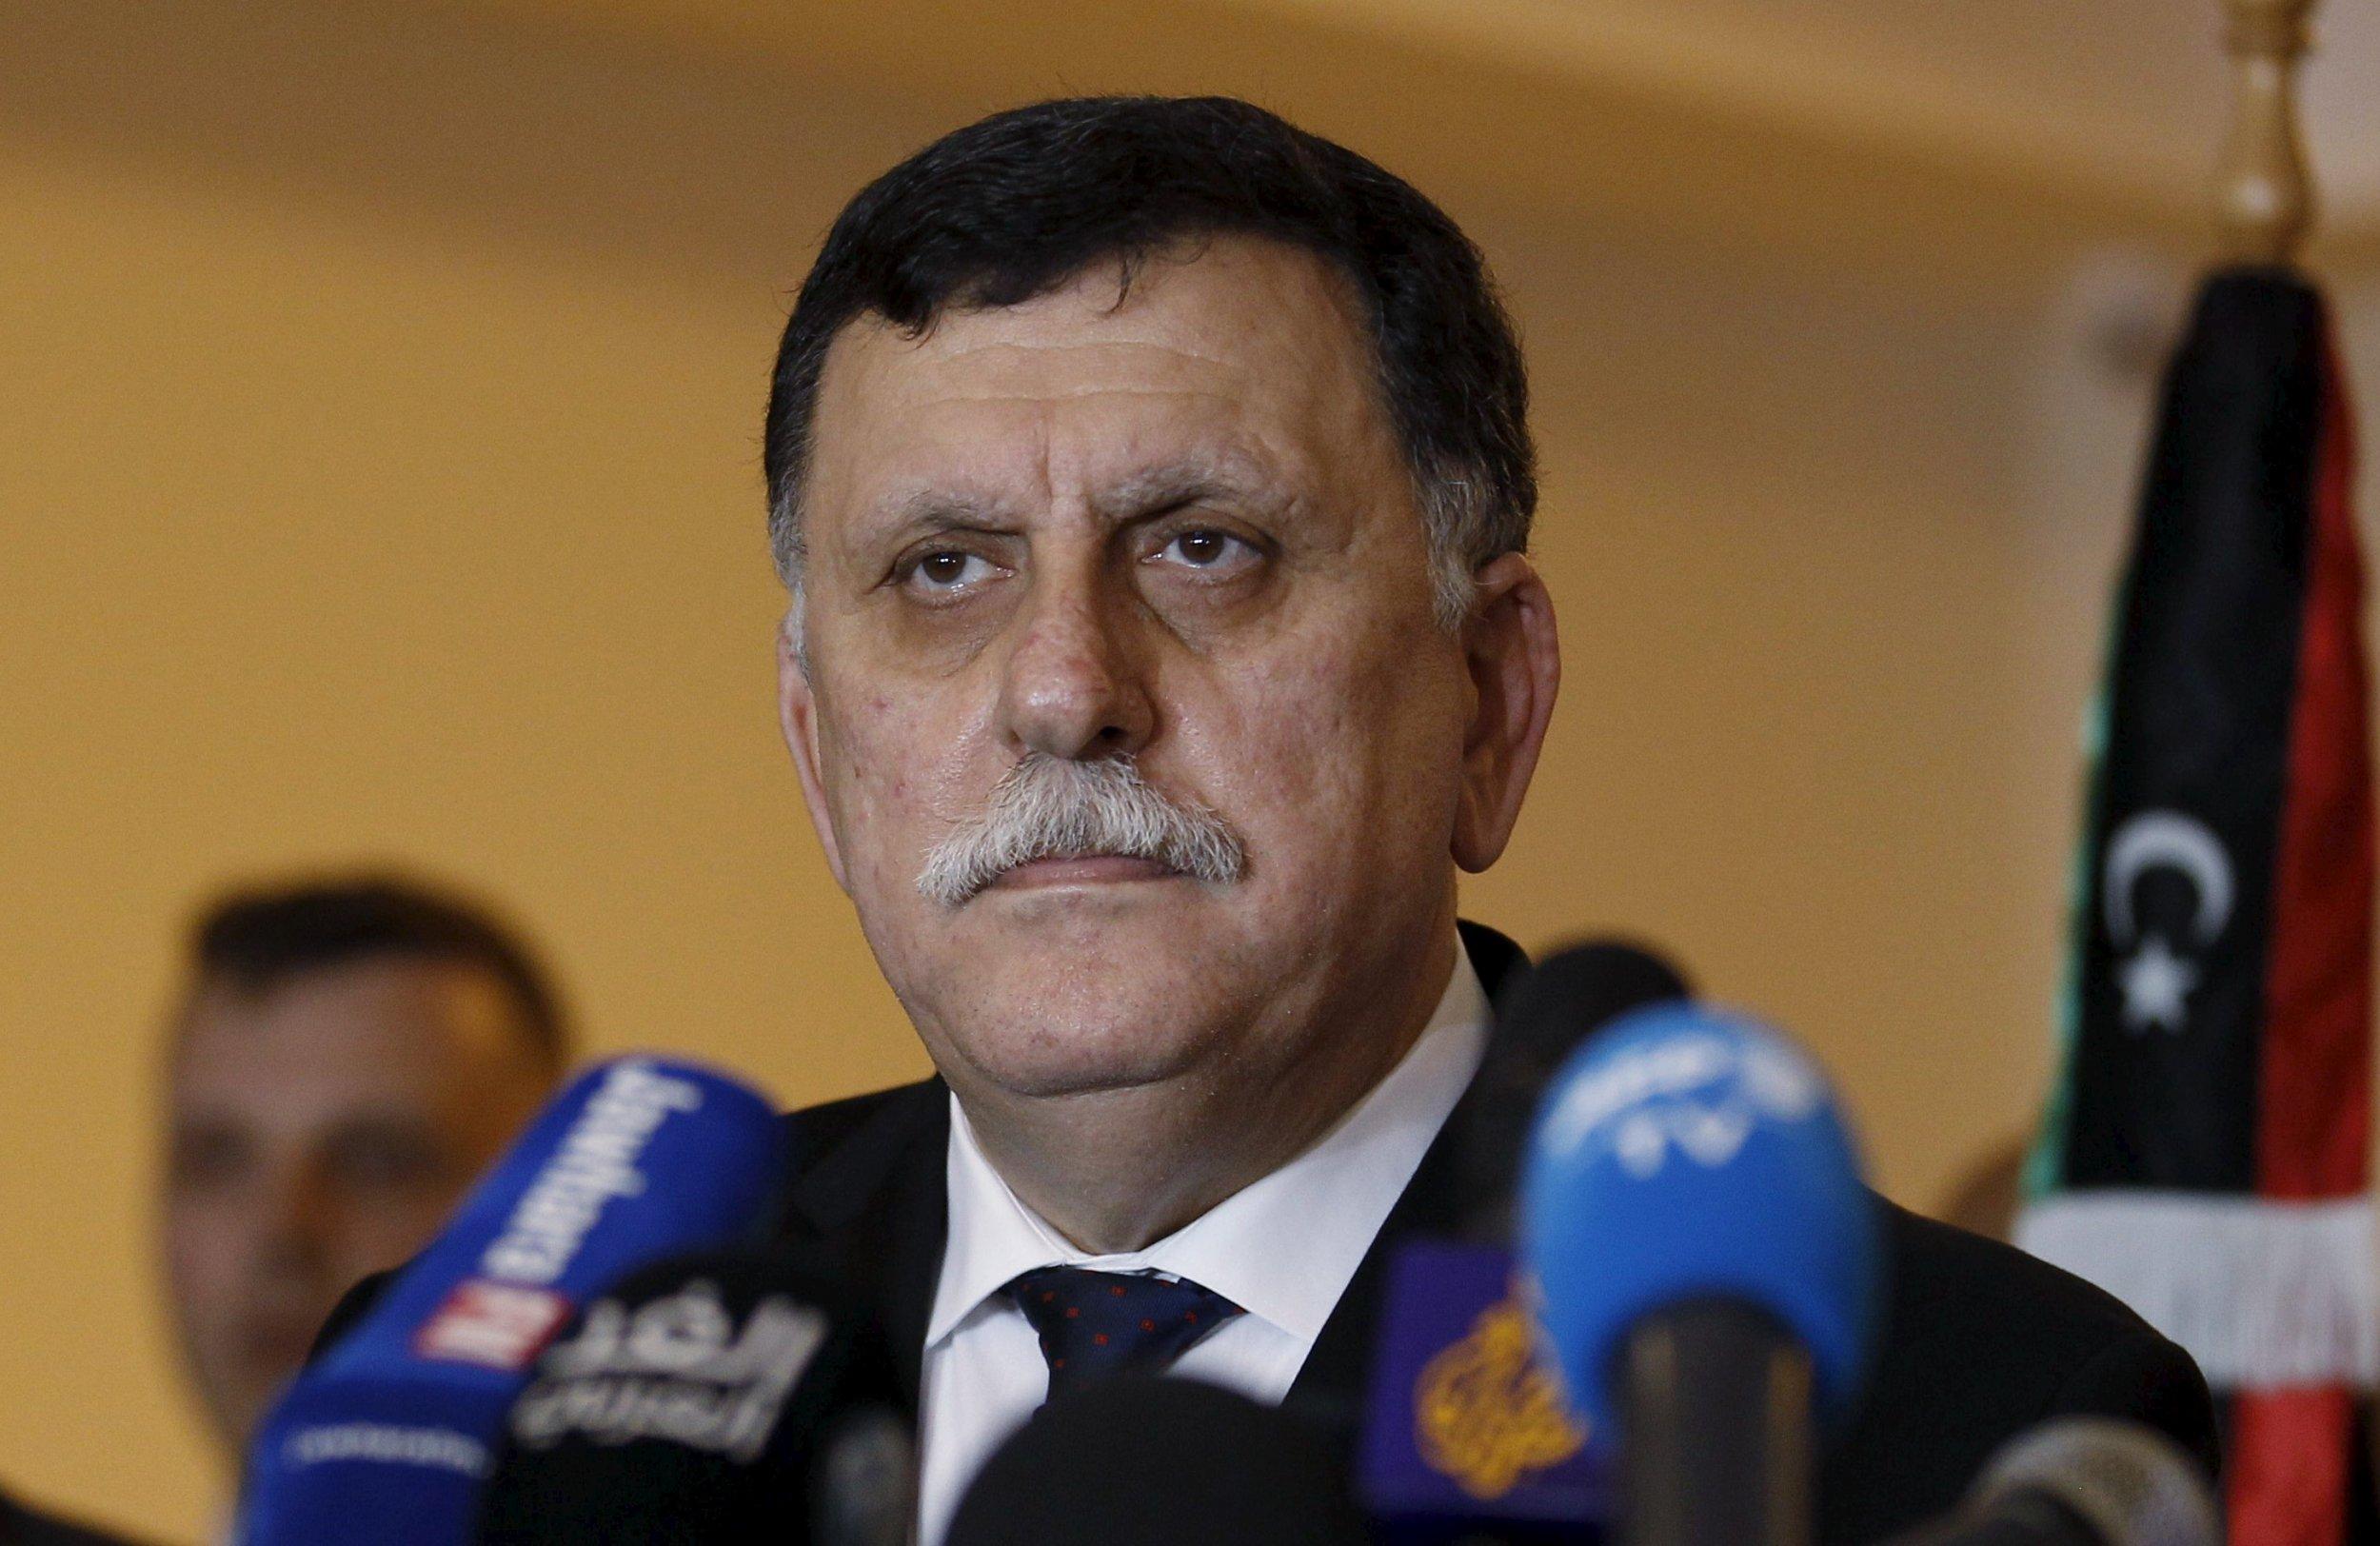 Libyan Prime Minister-designate Fayez Seraj attends a news conference in Tunis.